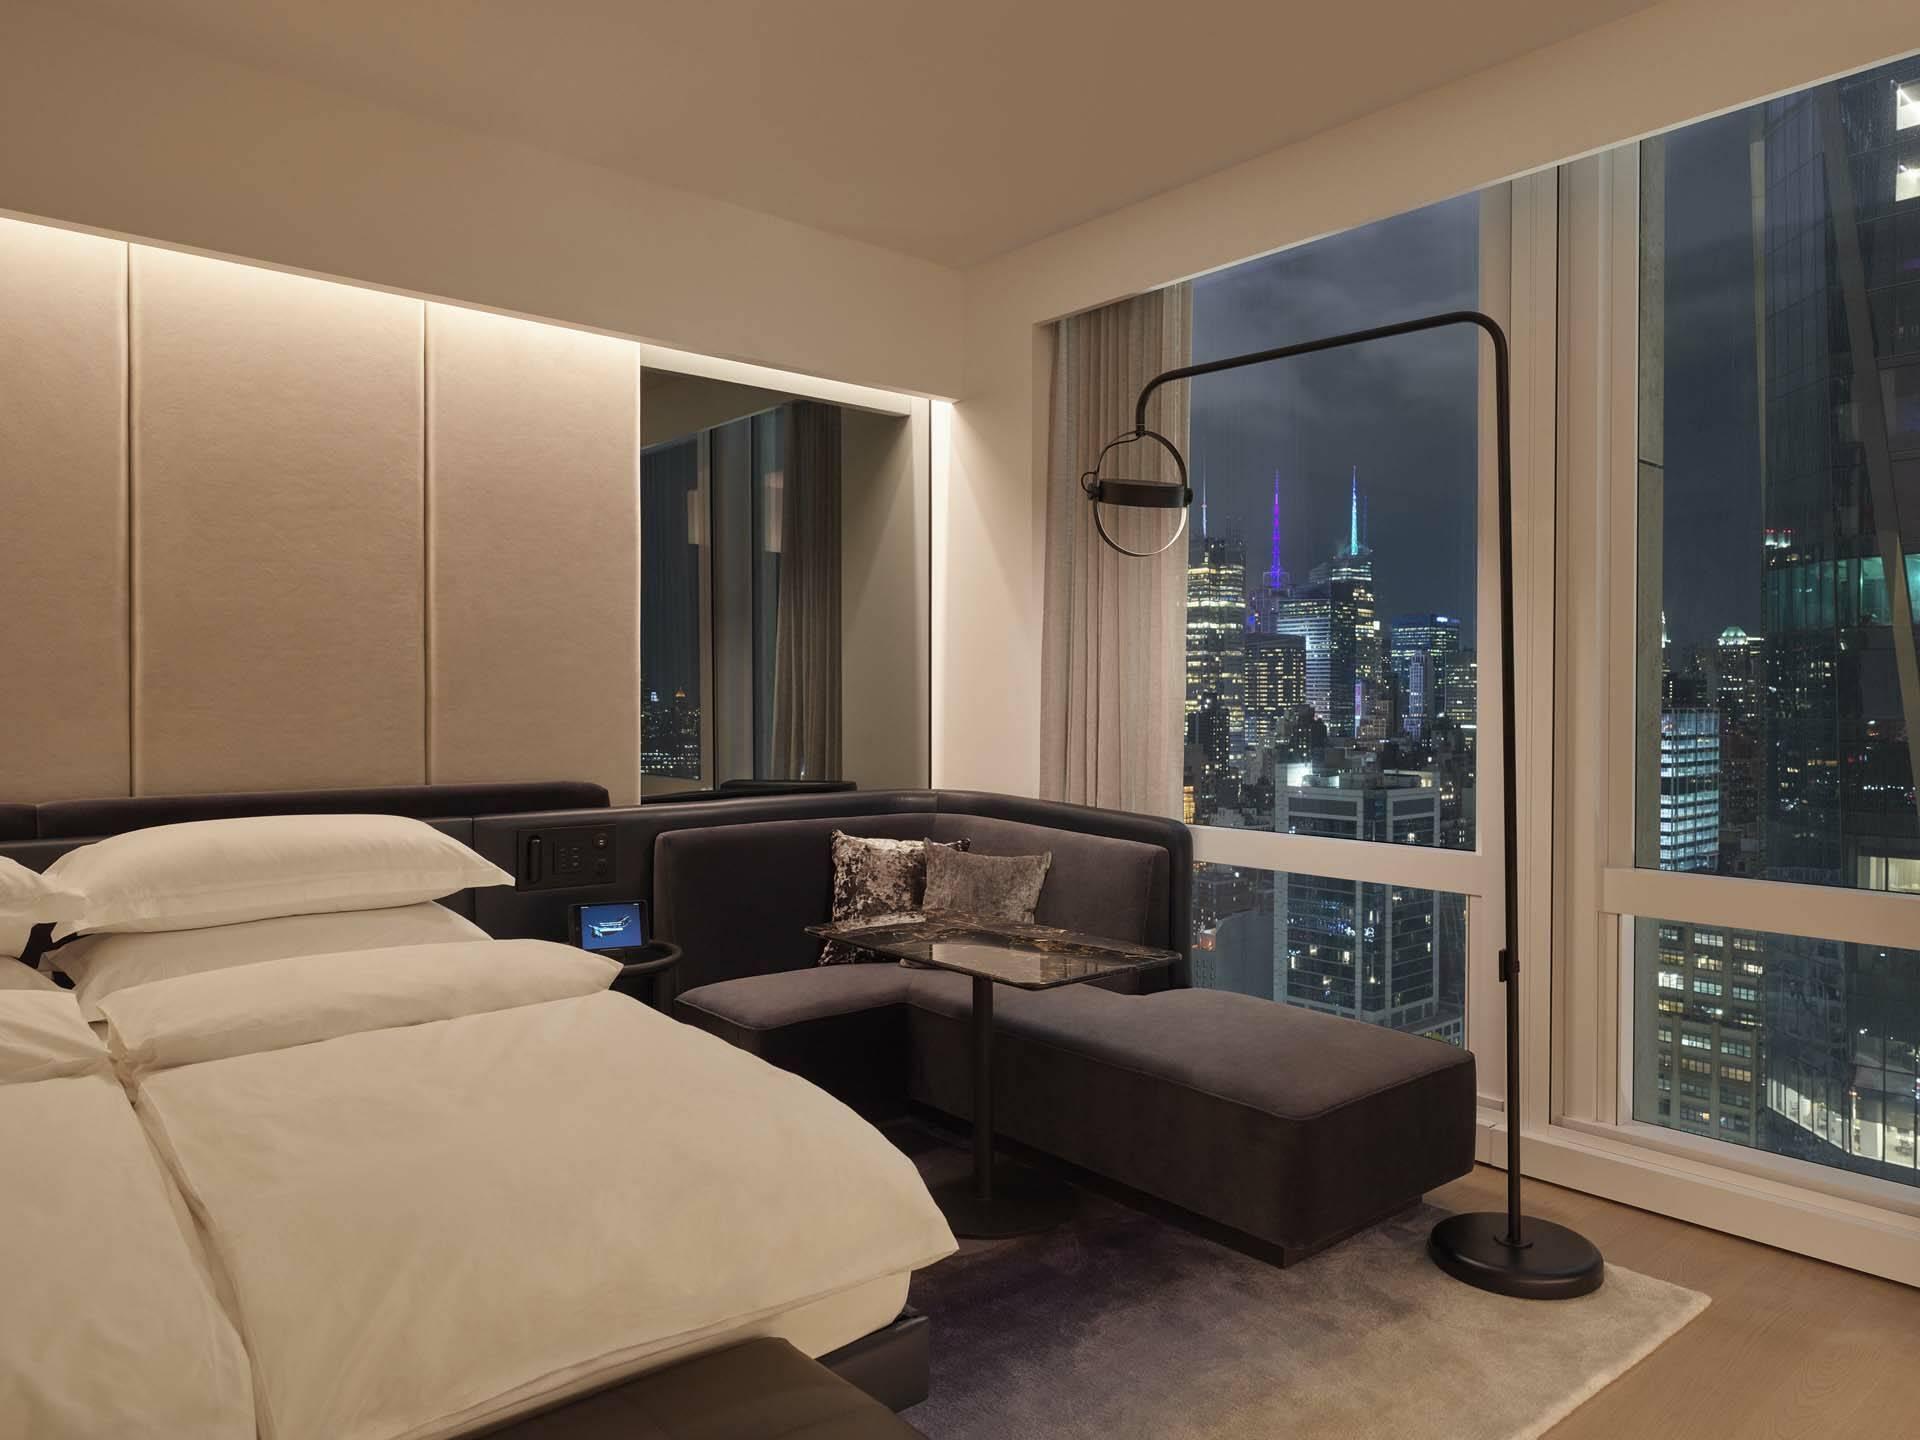 New York Equinox Hudson Yards Deluxe